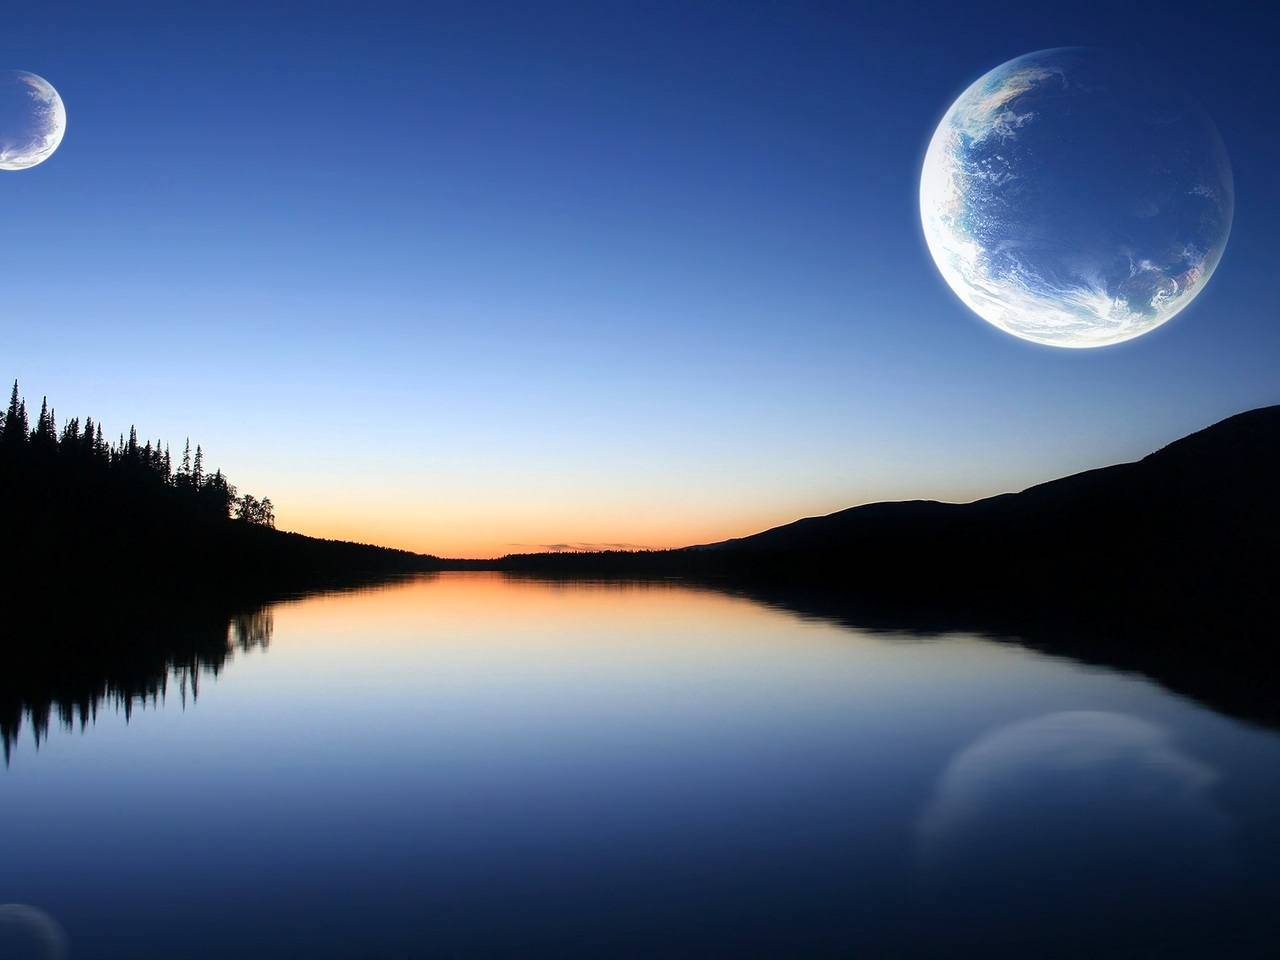 Serene Planets